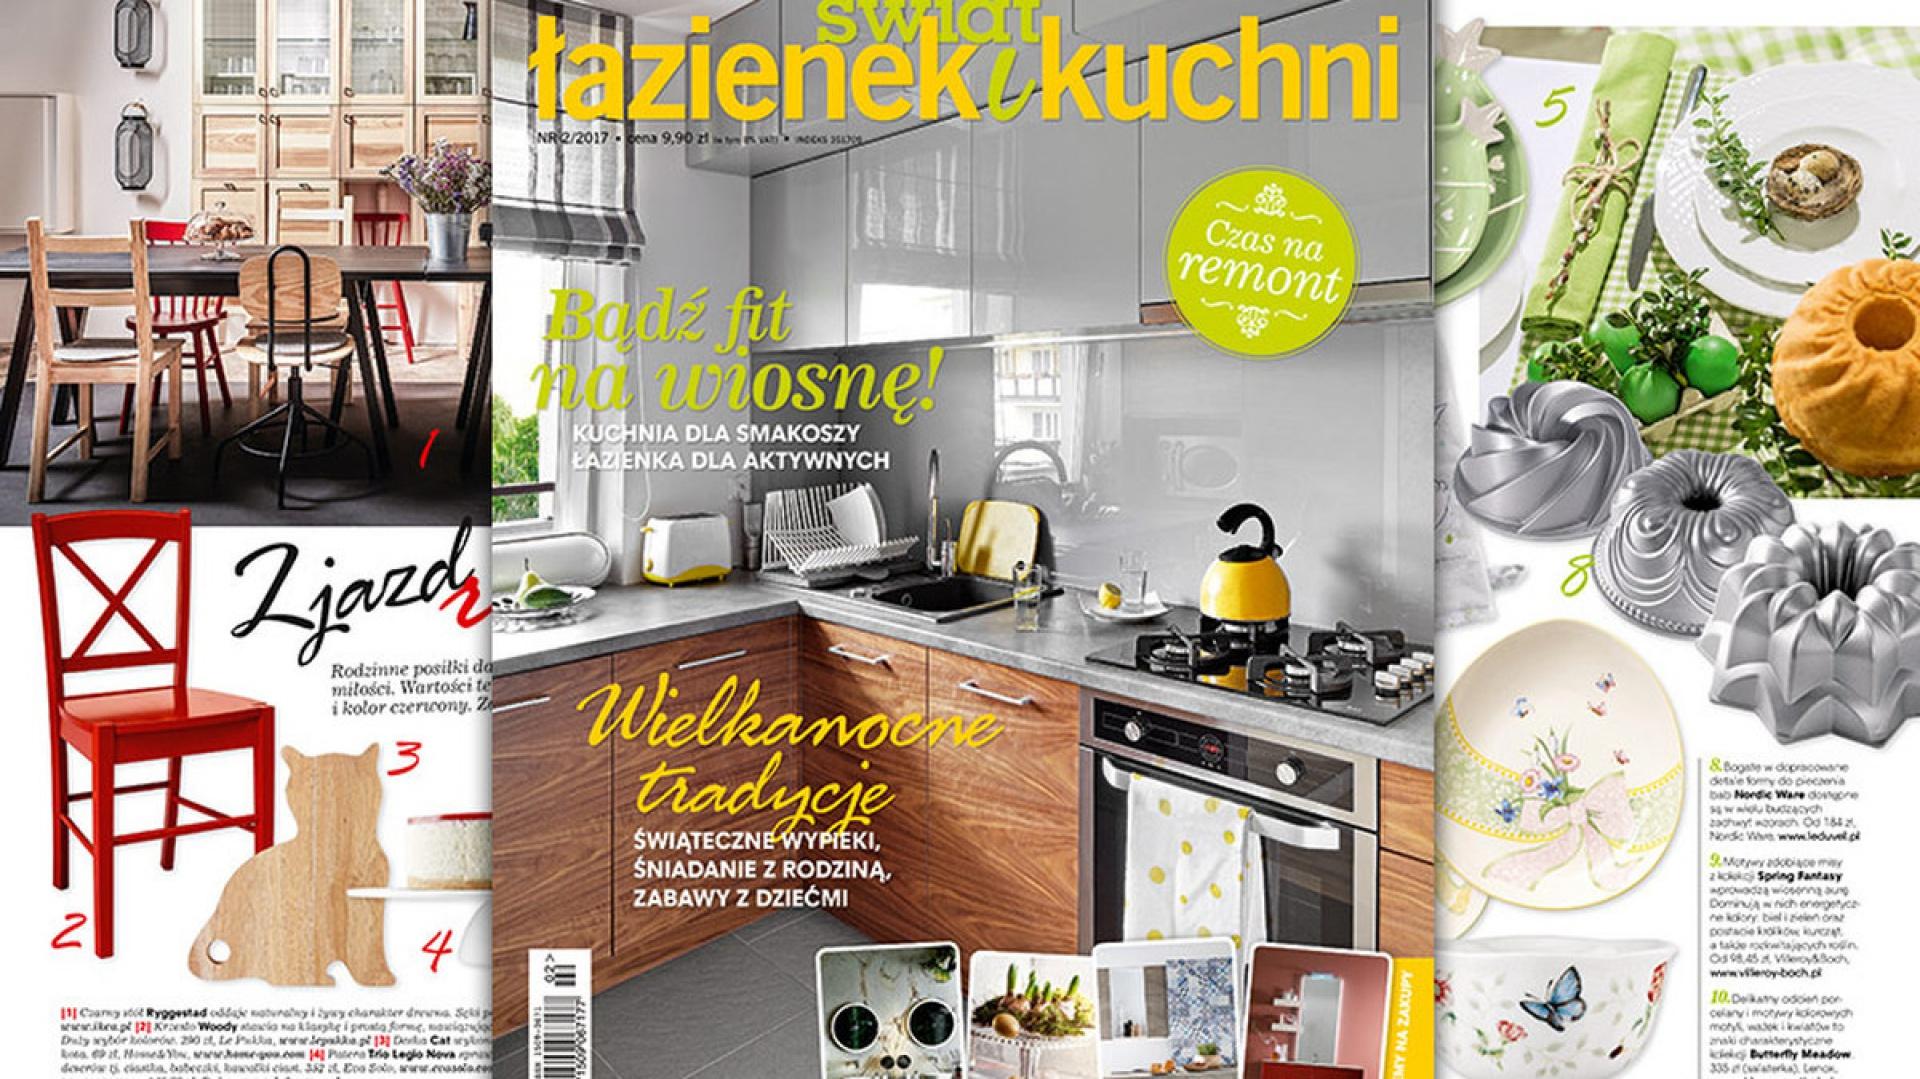 Świat łazienek i kuchni